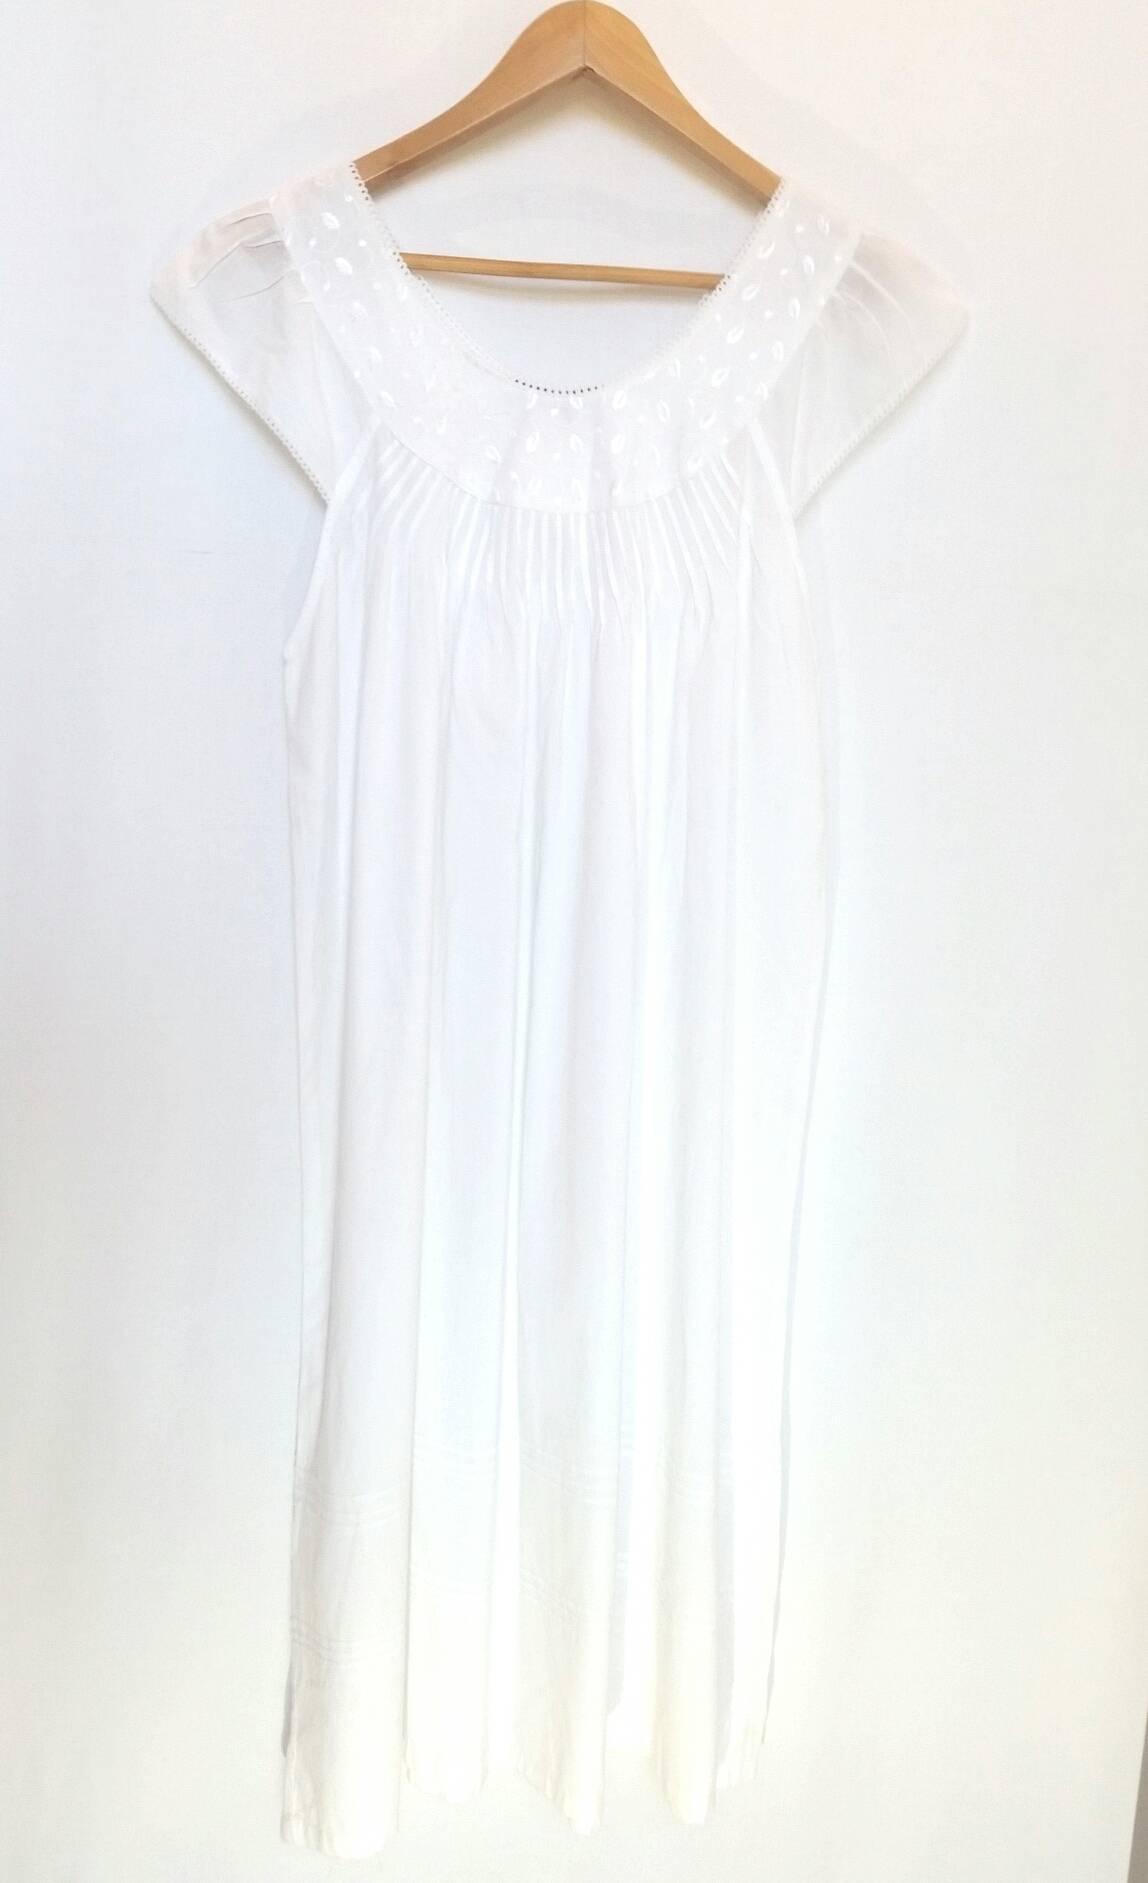 Pure Cotton Embroidered Nightie